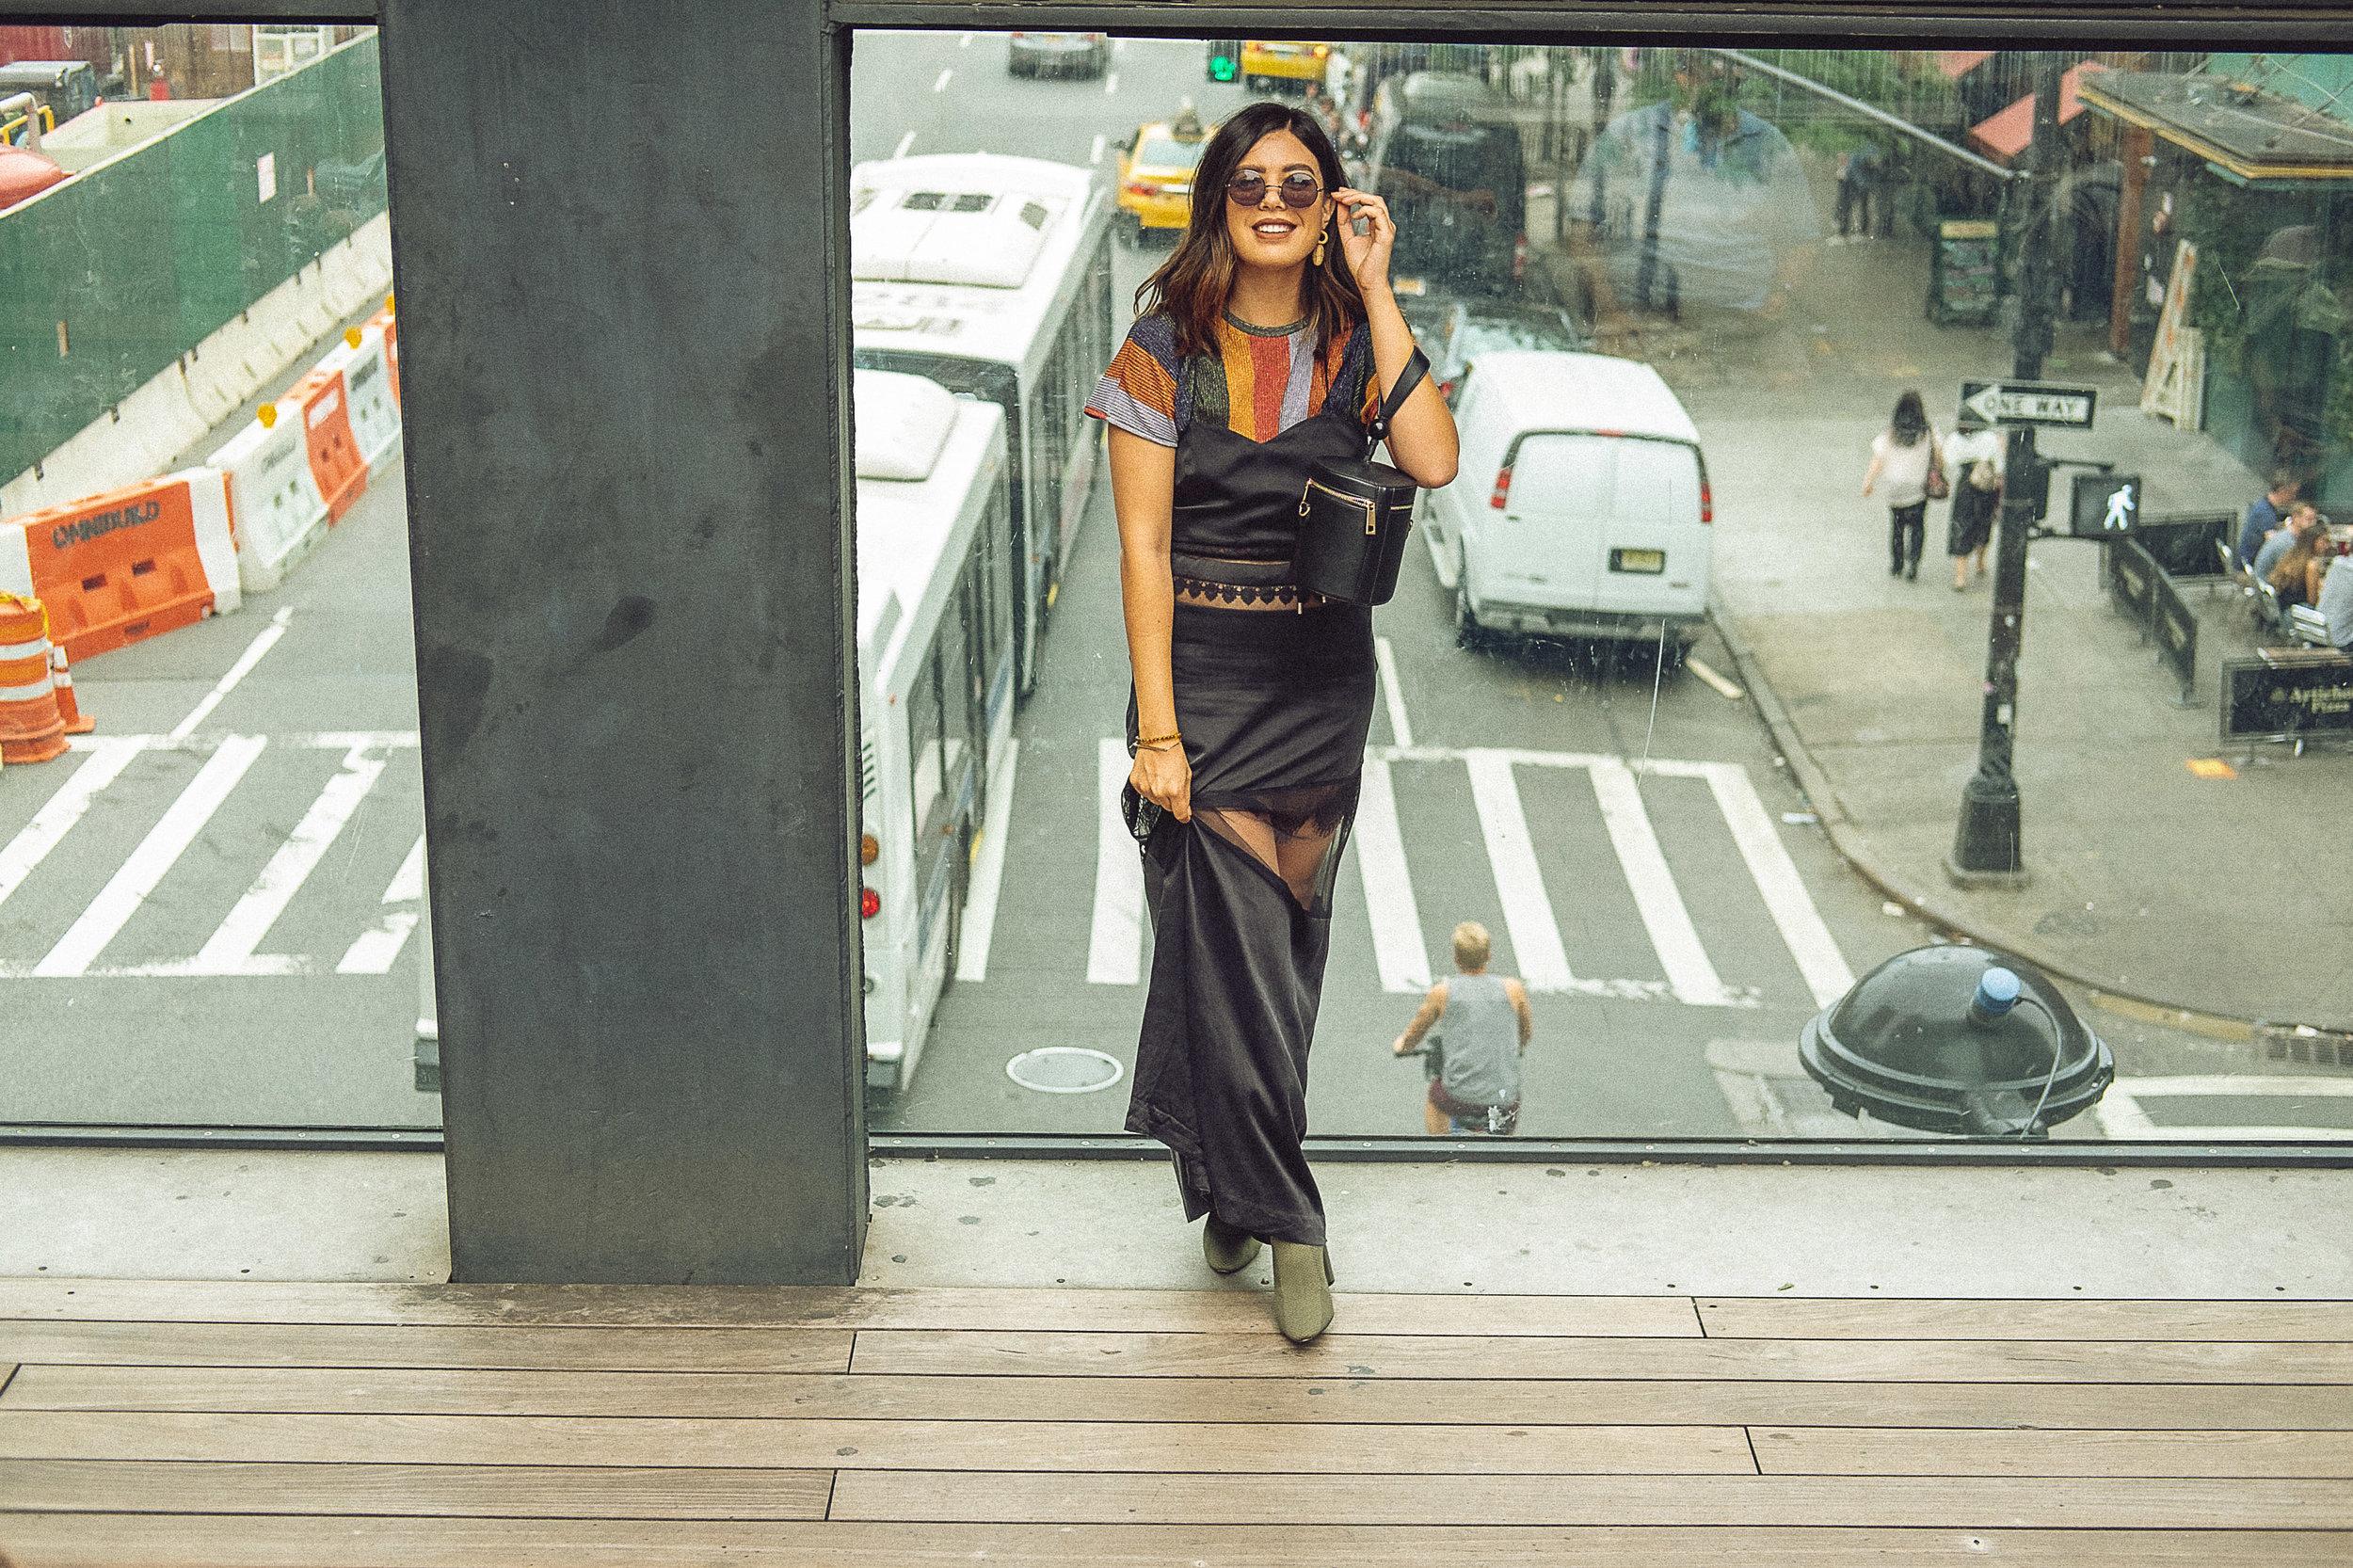 Rachel Off Duty: Travel Smarter Pack Lighter - New York Fashion Week